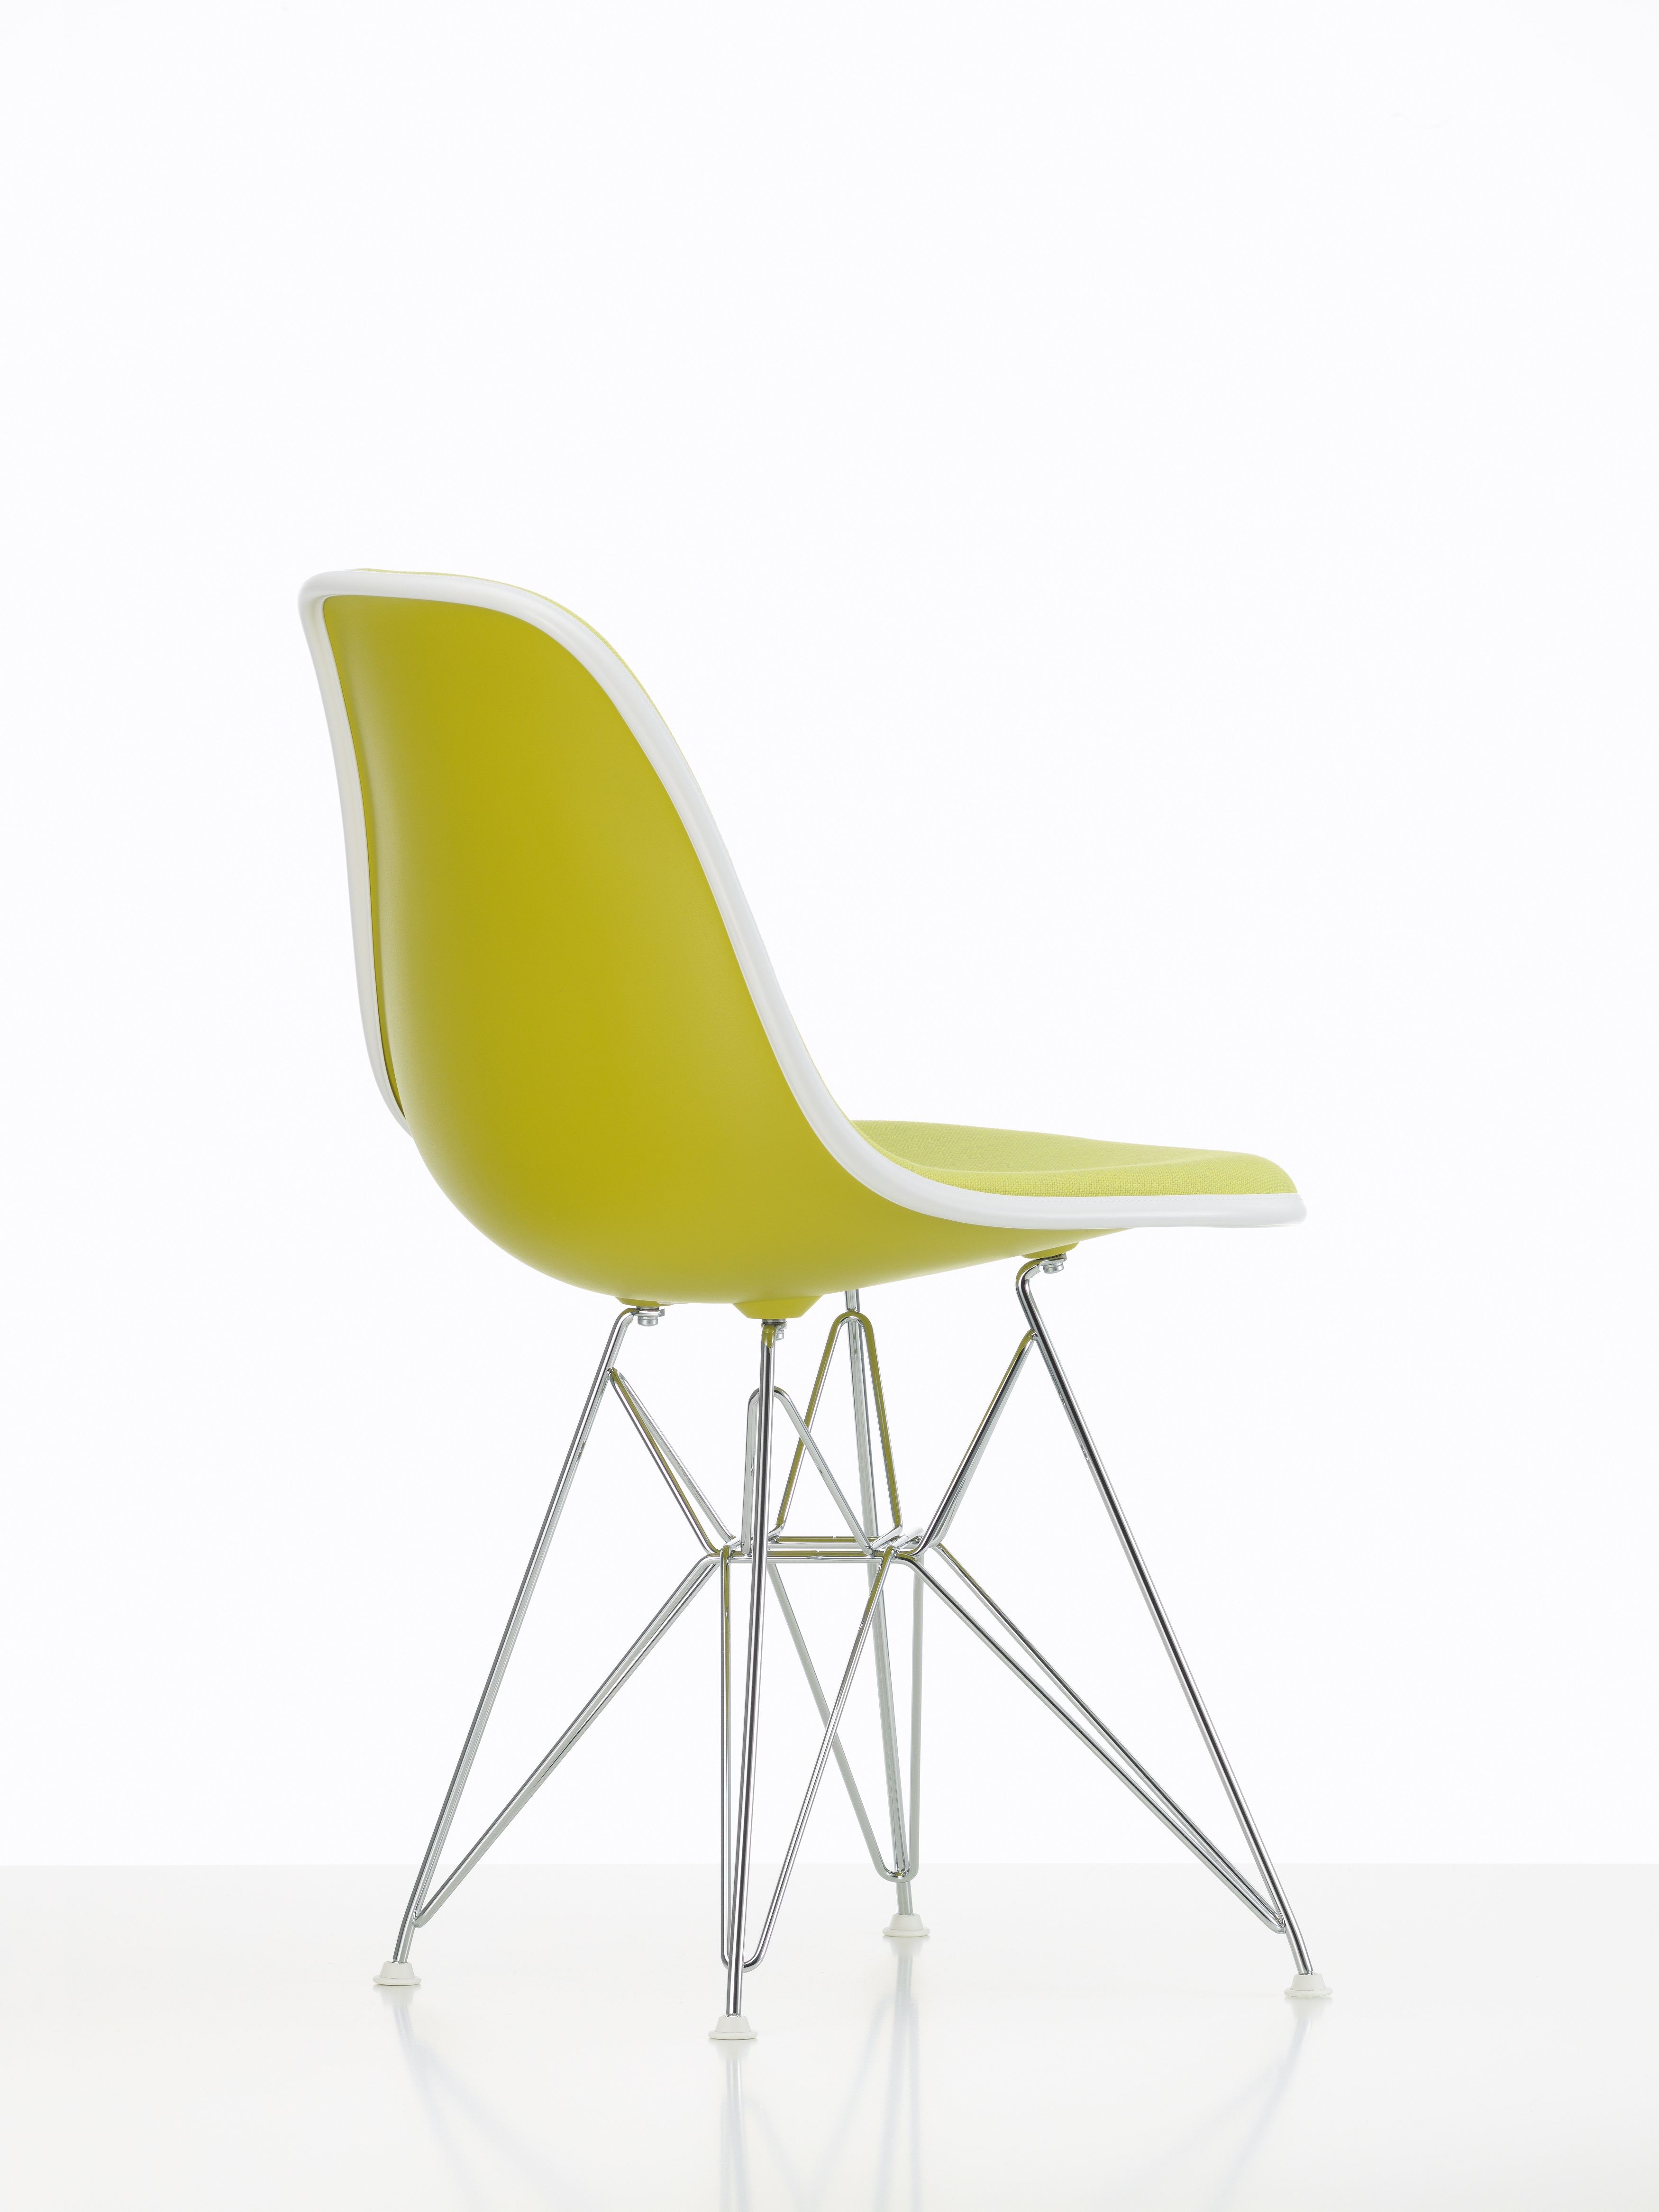 Vitra Stuhl Eames Plastic Sidechair Dsr Mit Polsterung